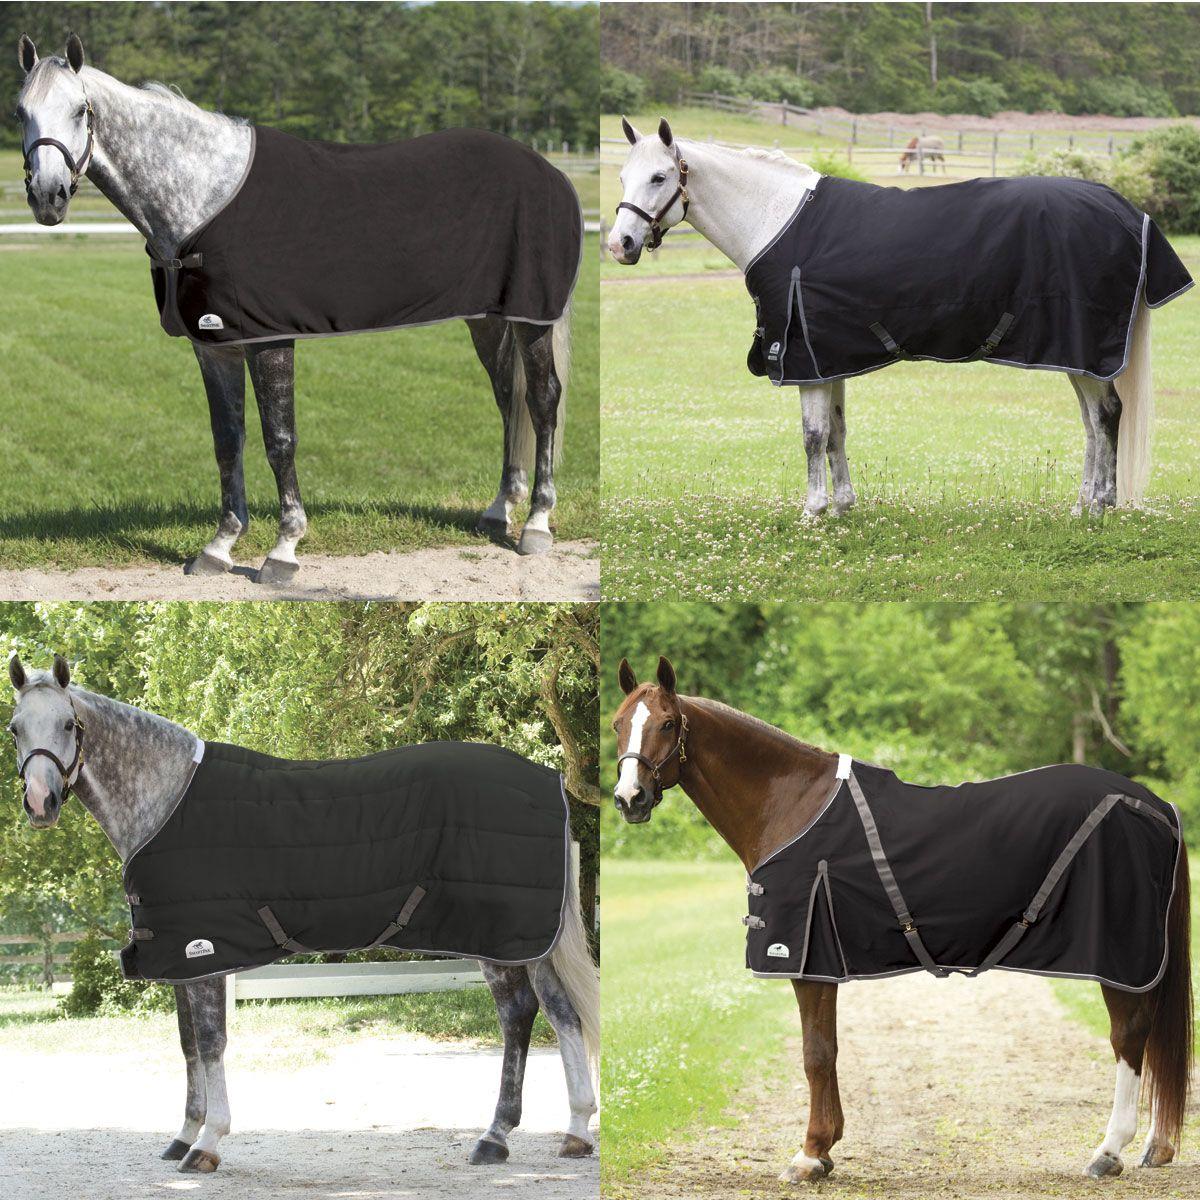 Smartpak Deluxe Blanket Set Blanket Sets From Smartpak Equine Smartpak Horse Blankets Horse Rugs